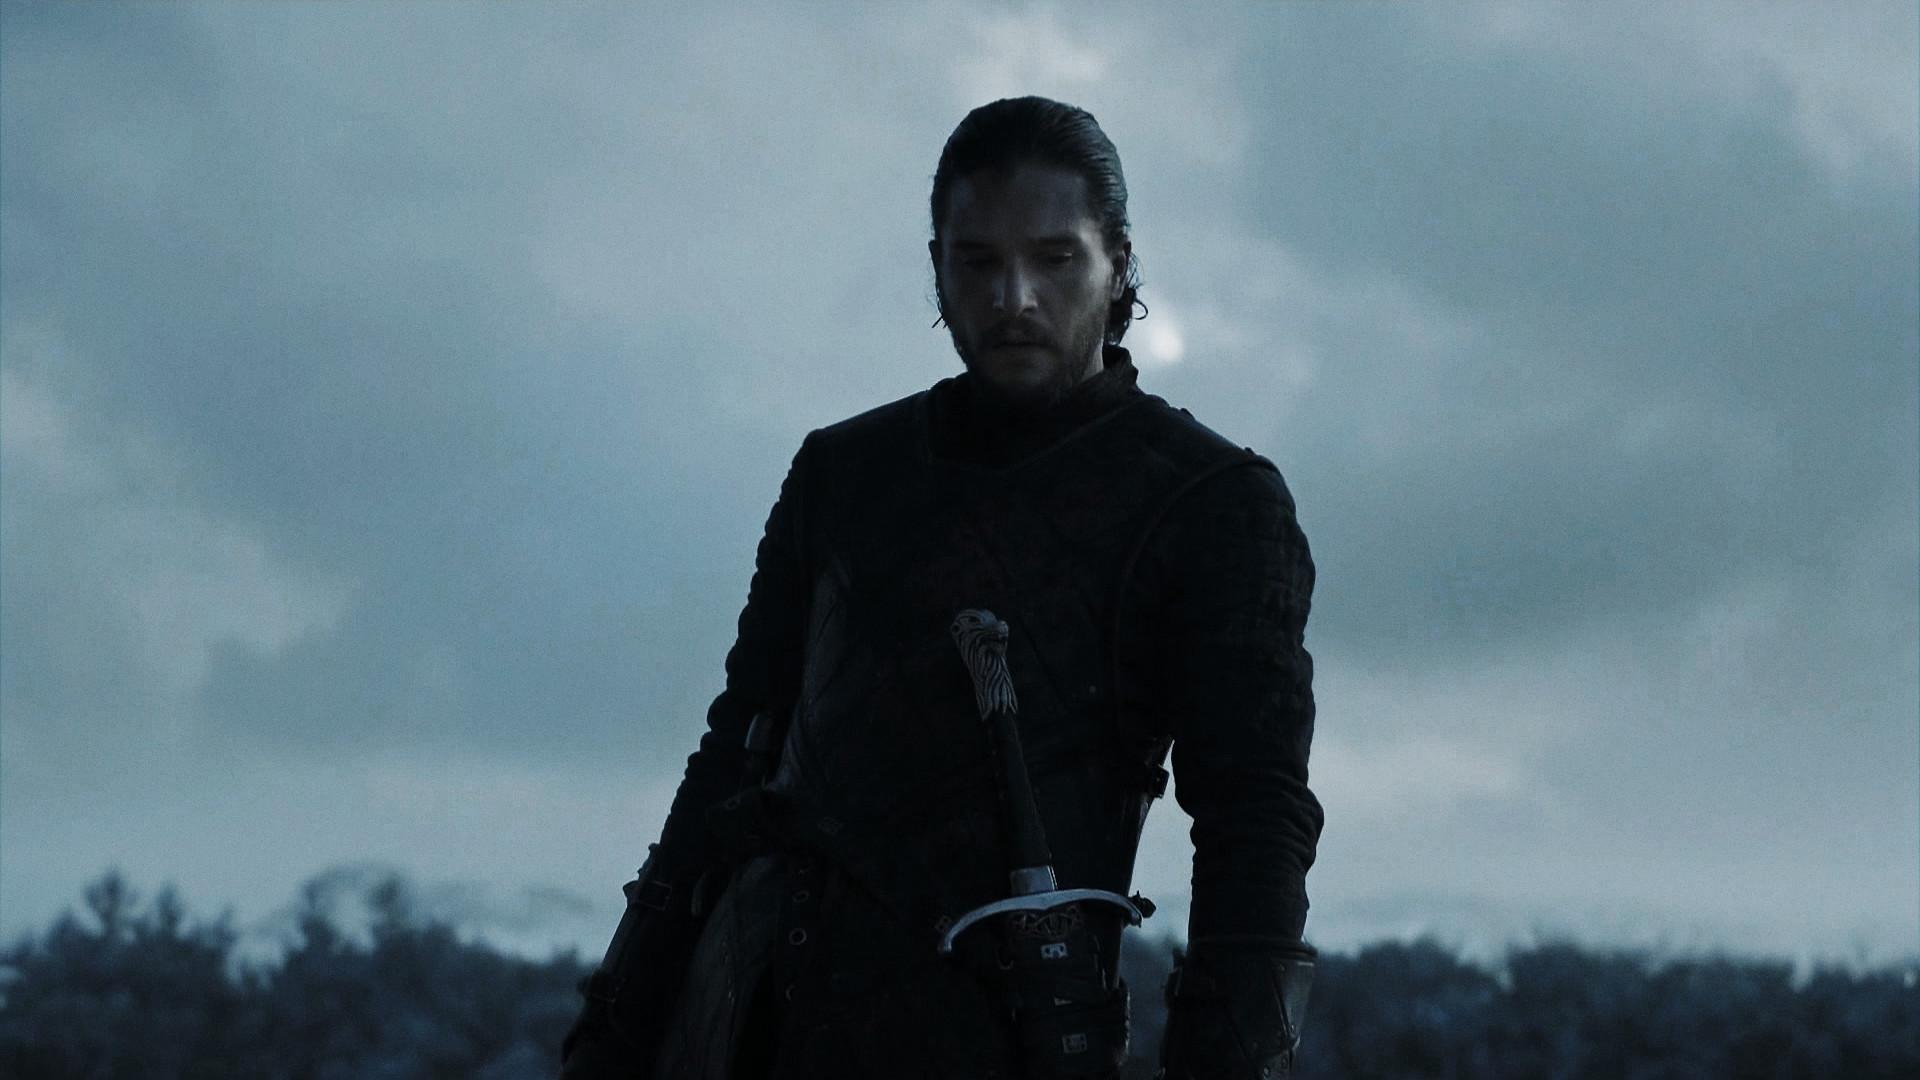 Res: 1920x1080, Fernsehserien - Game Of Thrones Jon Snow Kit Harington Wallpaper